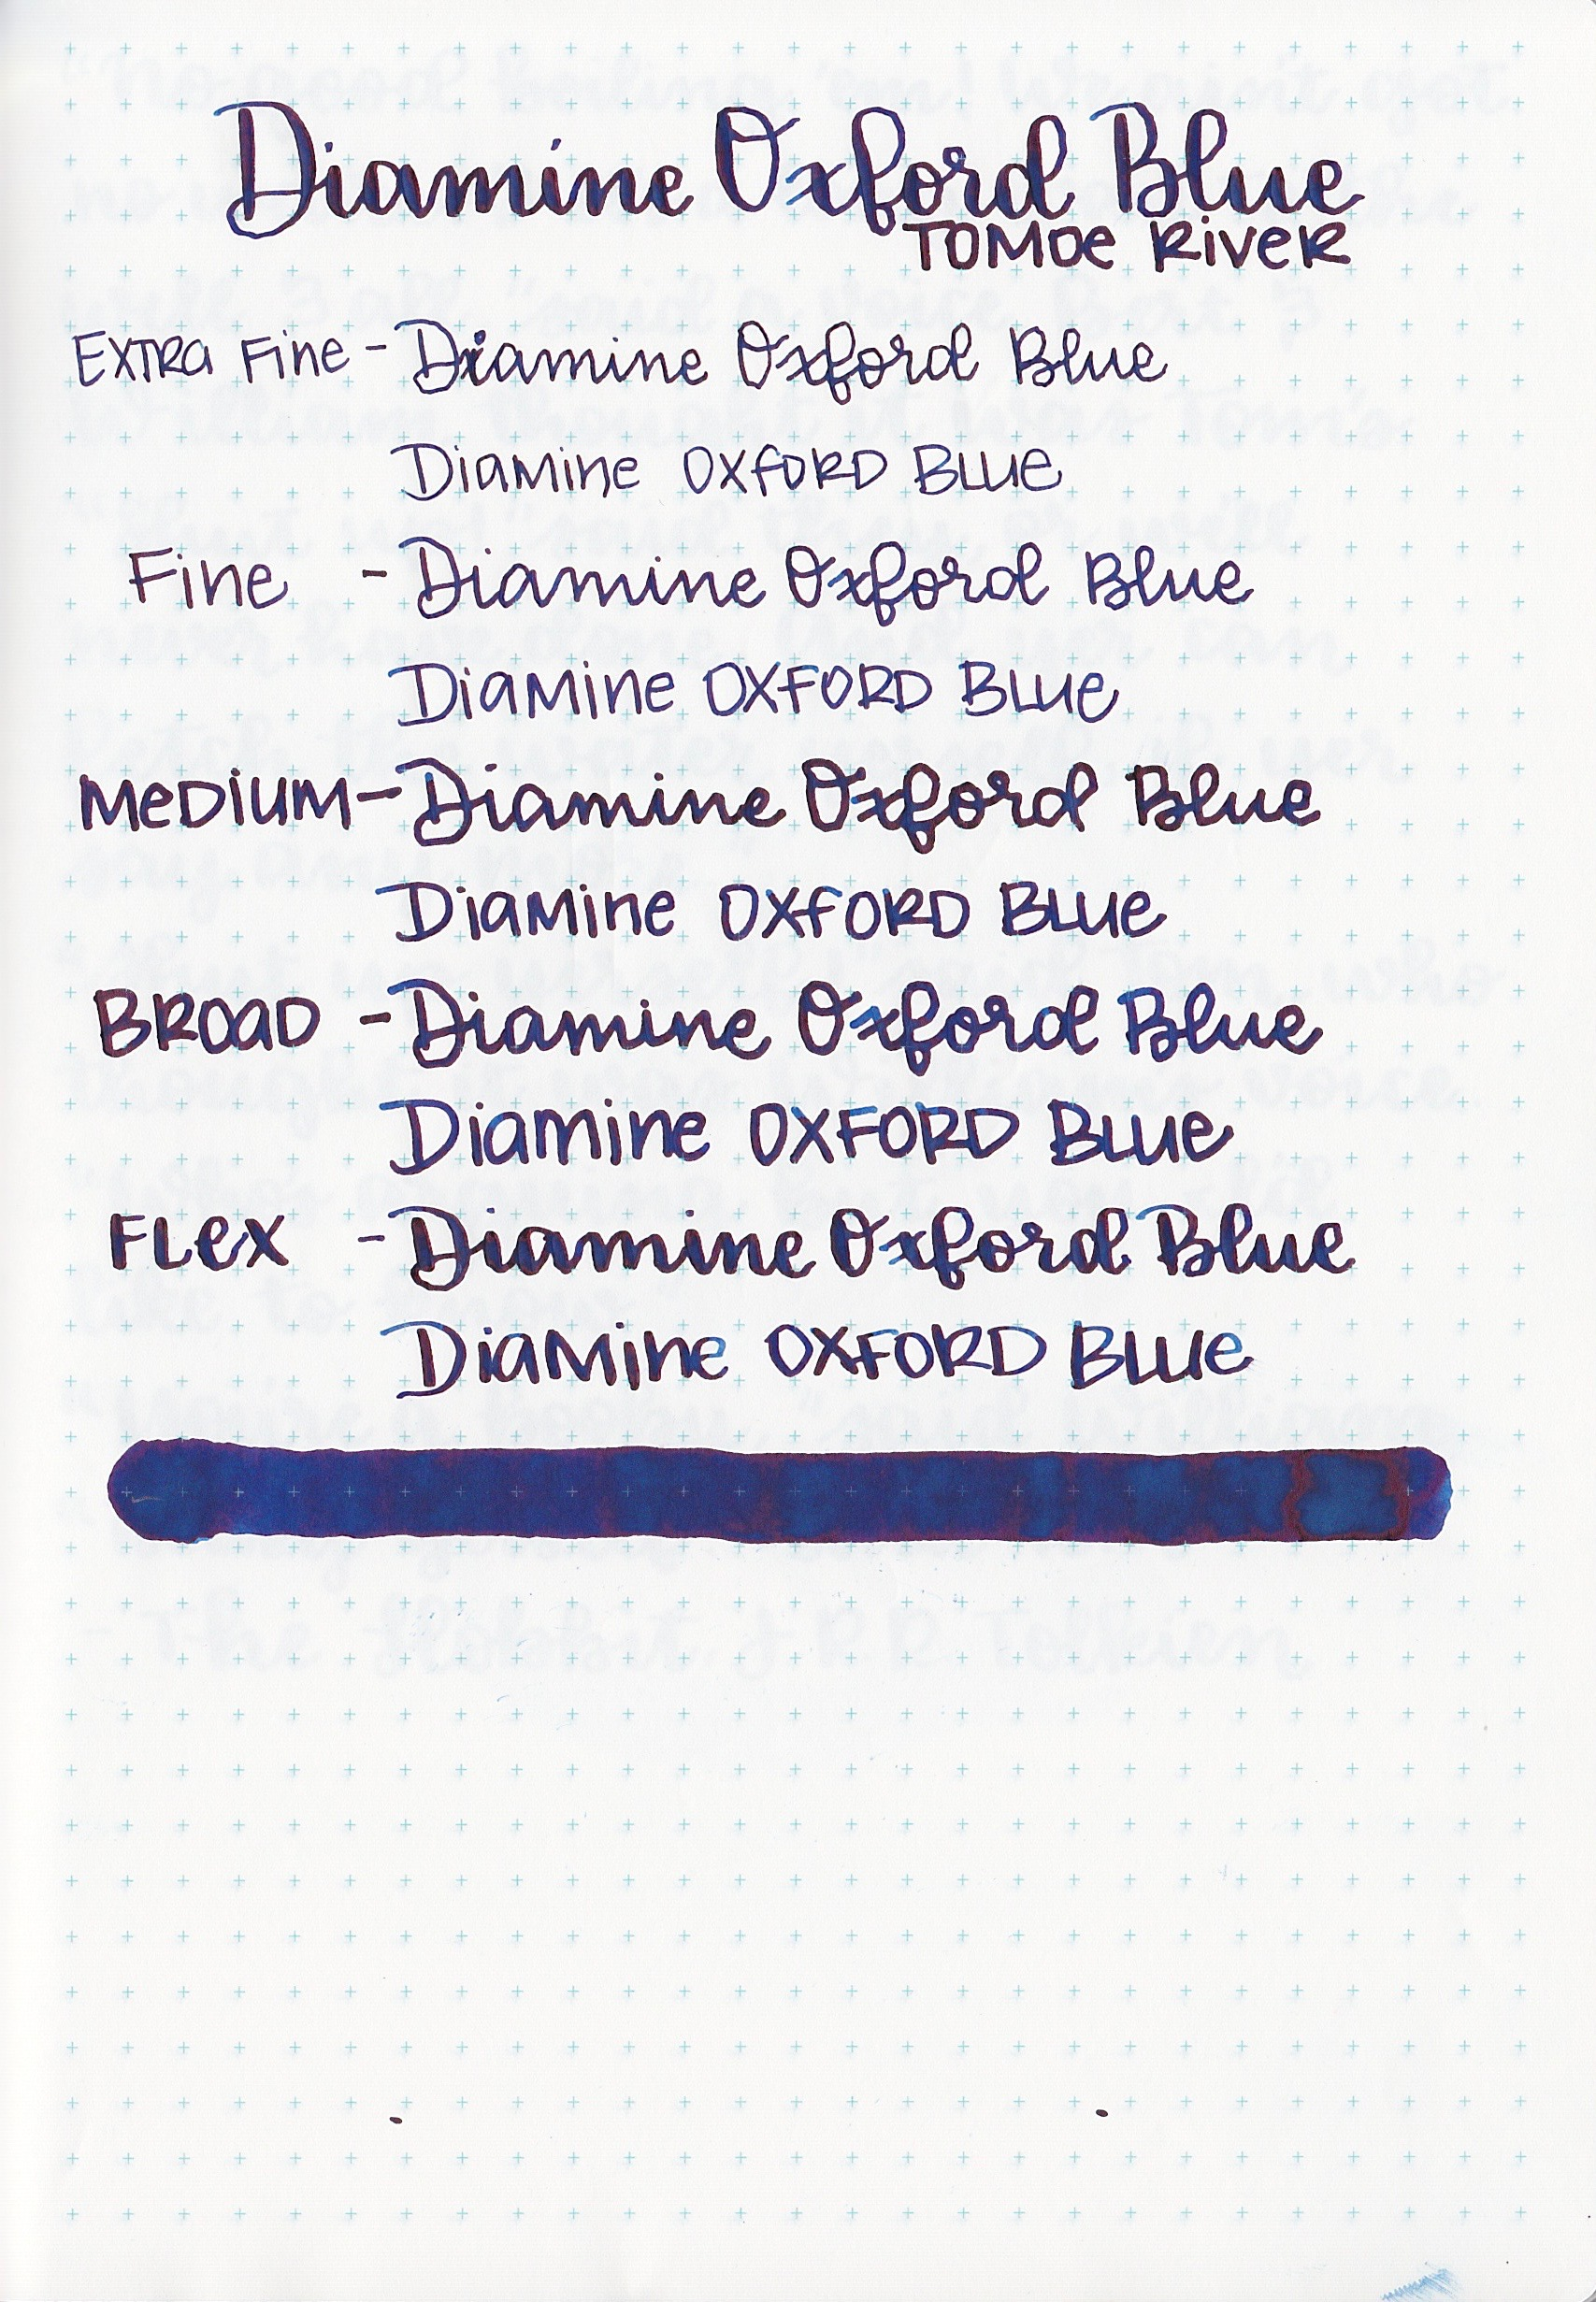 DOxfordBlue - 15.jpg